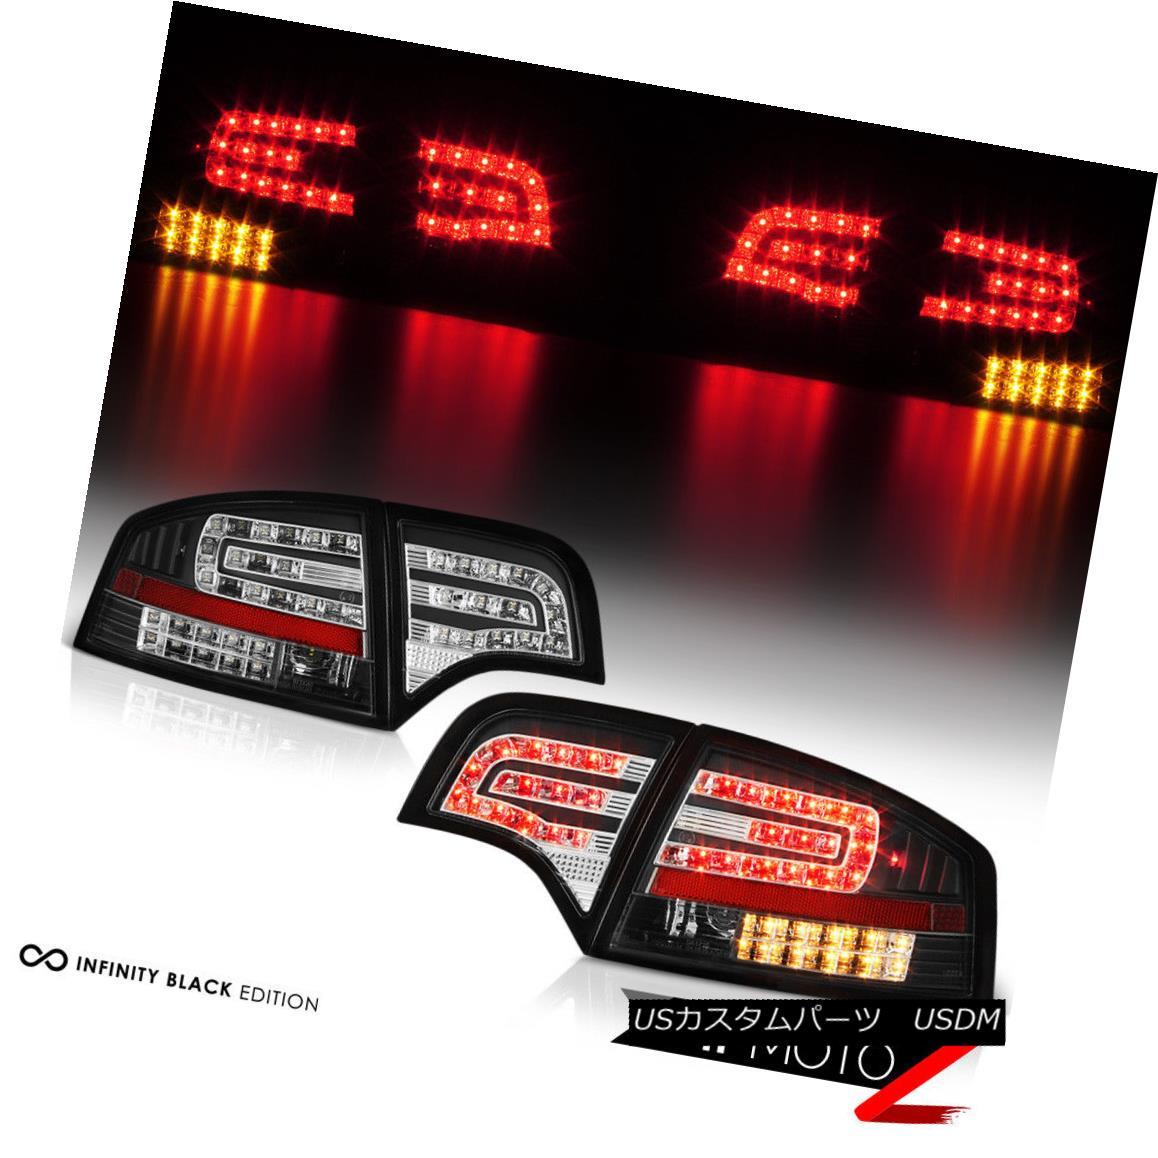 NEW 2005-2008 FITS AUDI A4 S4 RS4 TAIL LIGHT LEFT SEDAN AU2800103 8E5945095A